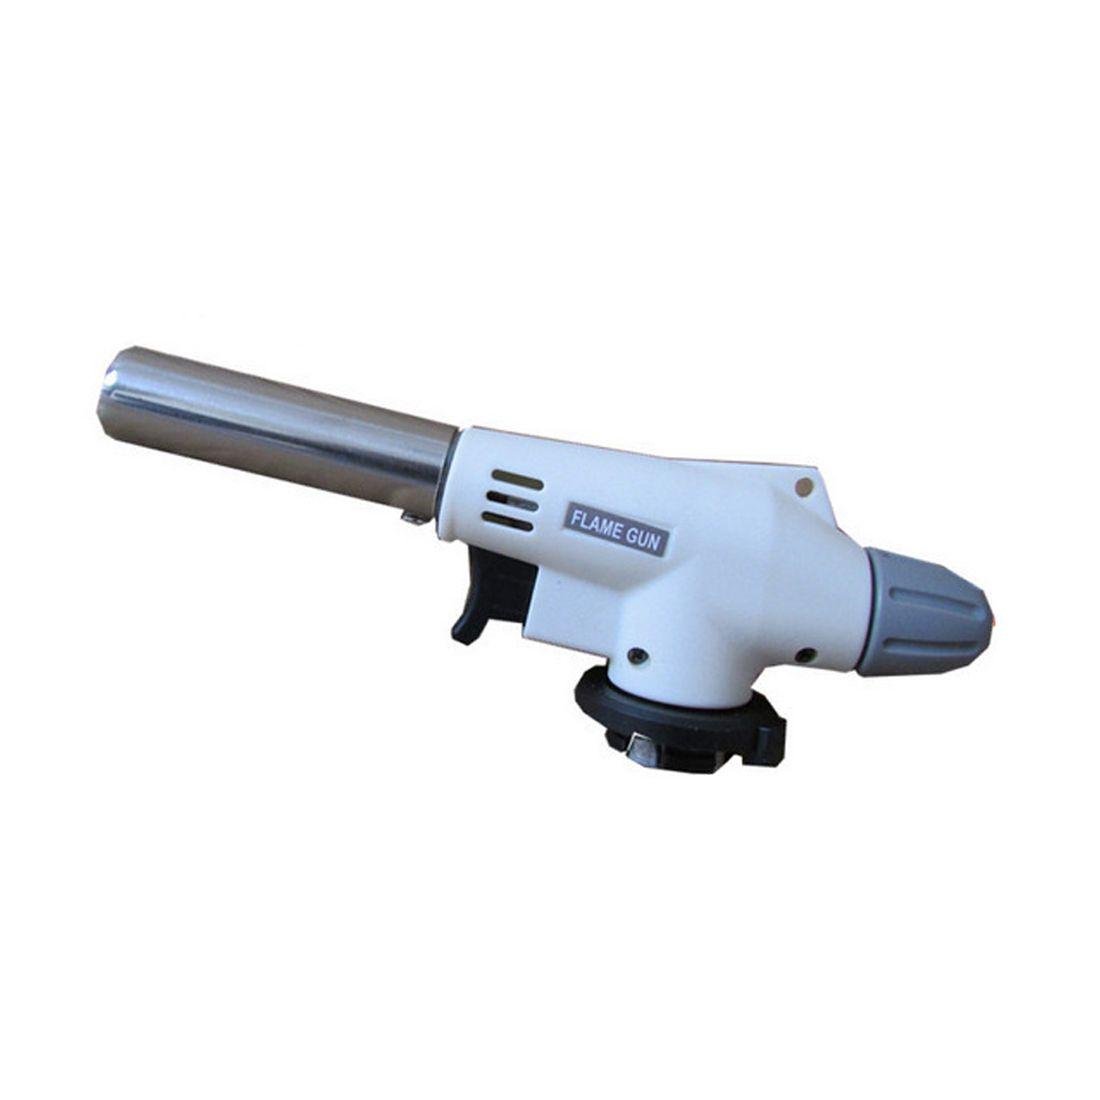 Gas Torch Flame Gun Blowtorch Cooking Soldering Butane AutoIgnition gas-Burner Lighter Heating Welding Gas burner Flame